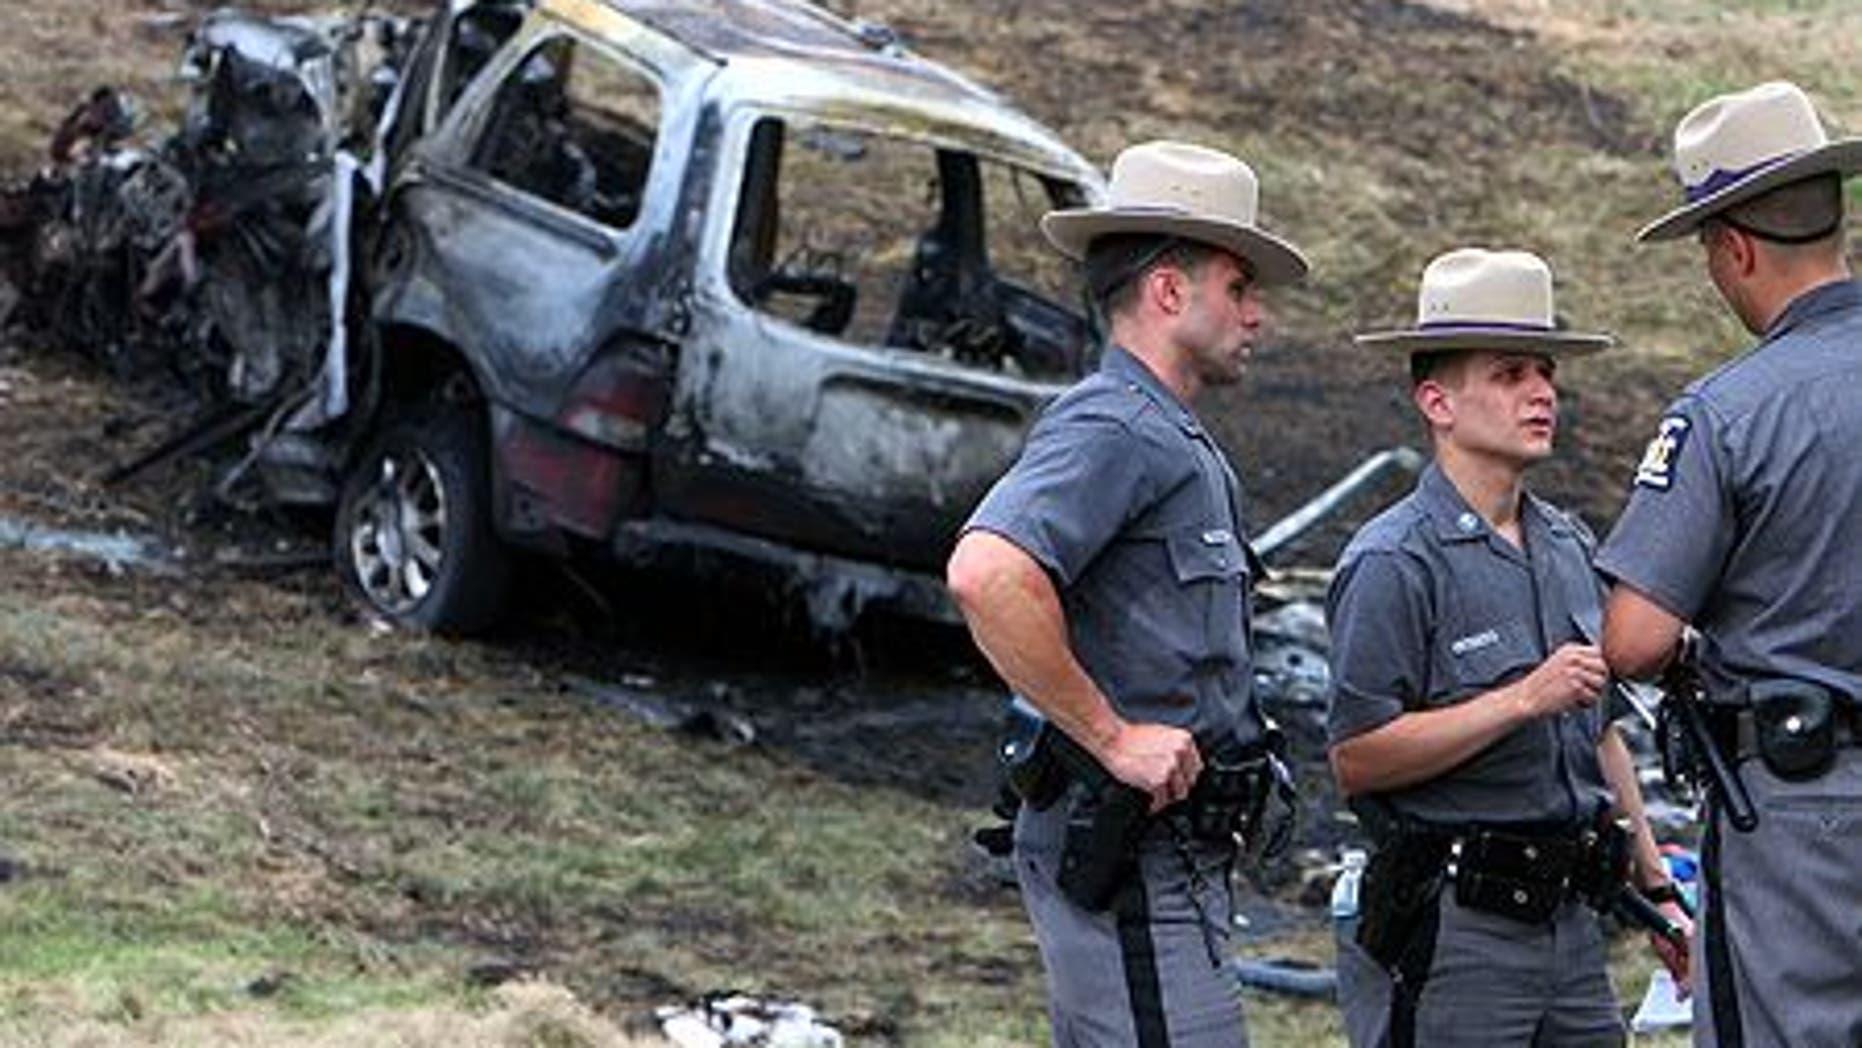 Scene of suspected drunk driving incident in Hawthorne, N.Y. in 2009.